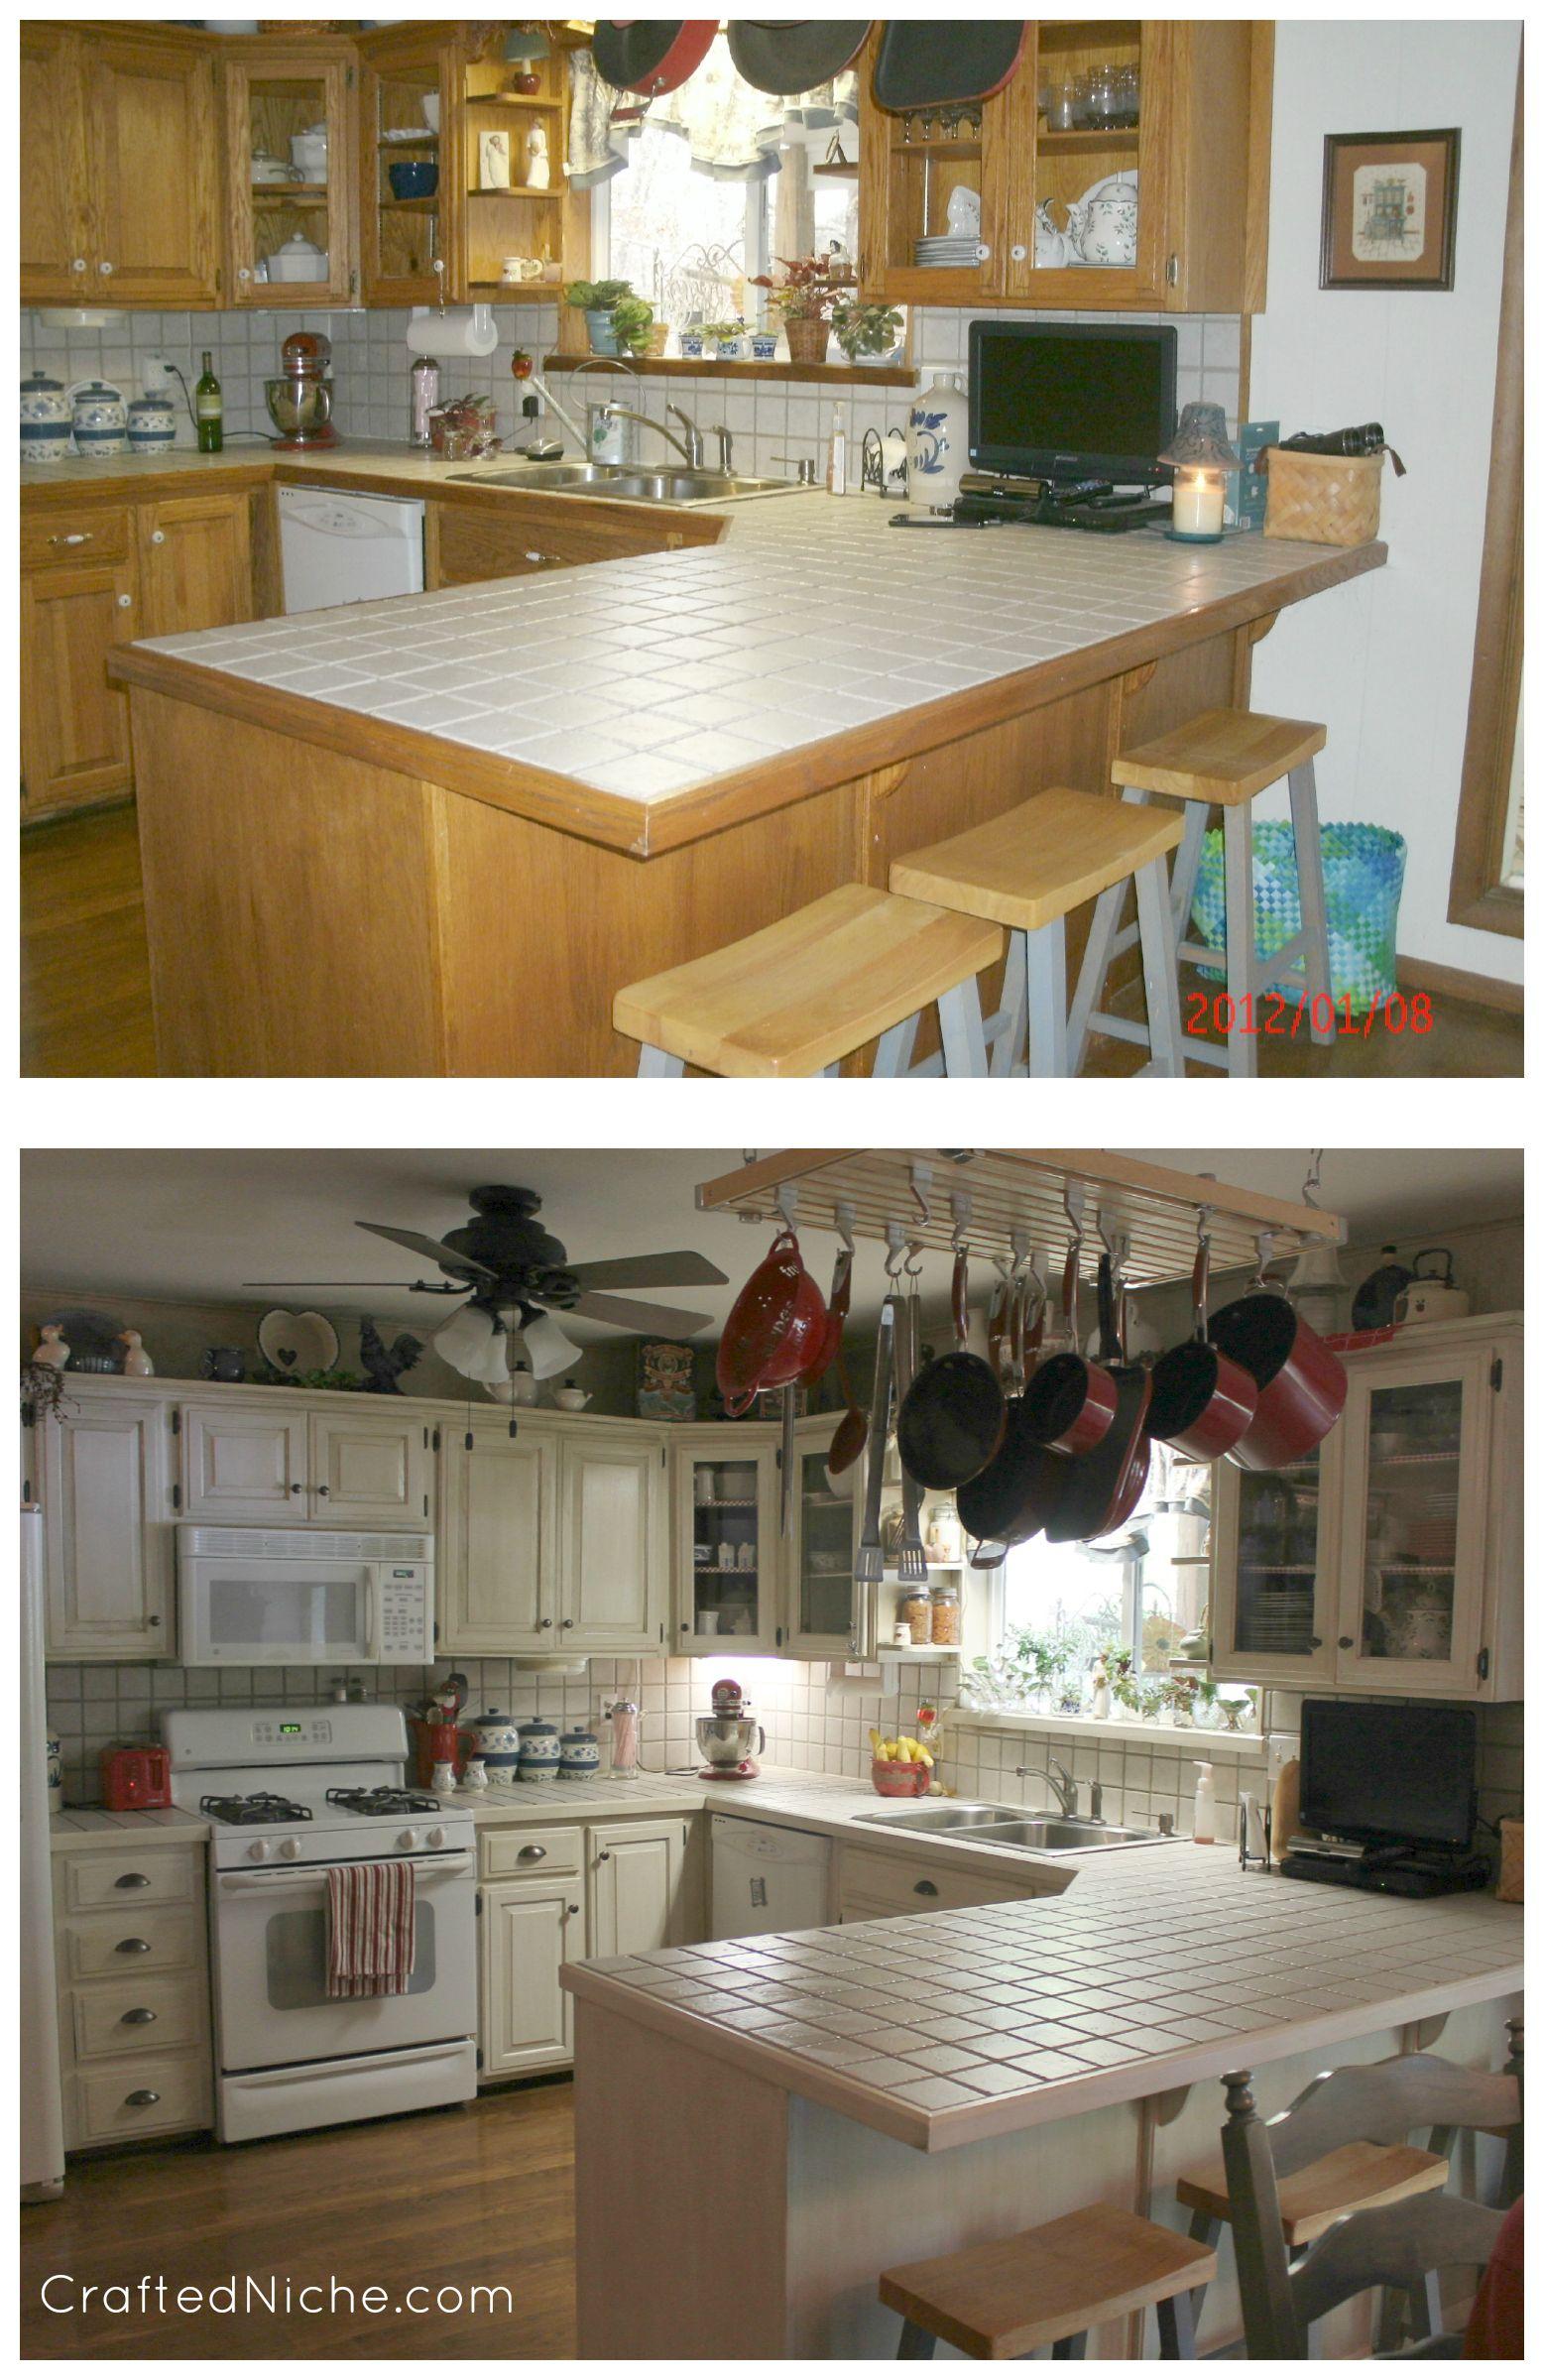 Pintar gabinetes de cocina ideas uk - Rustoleum Transformations Linen Before And After 3